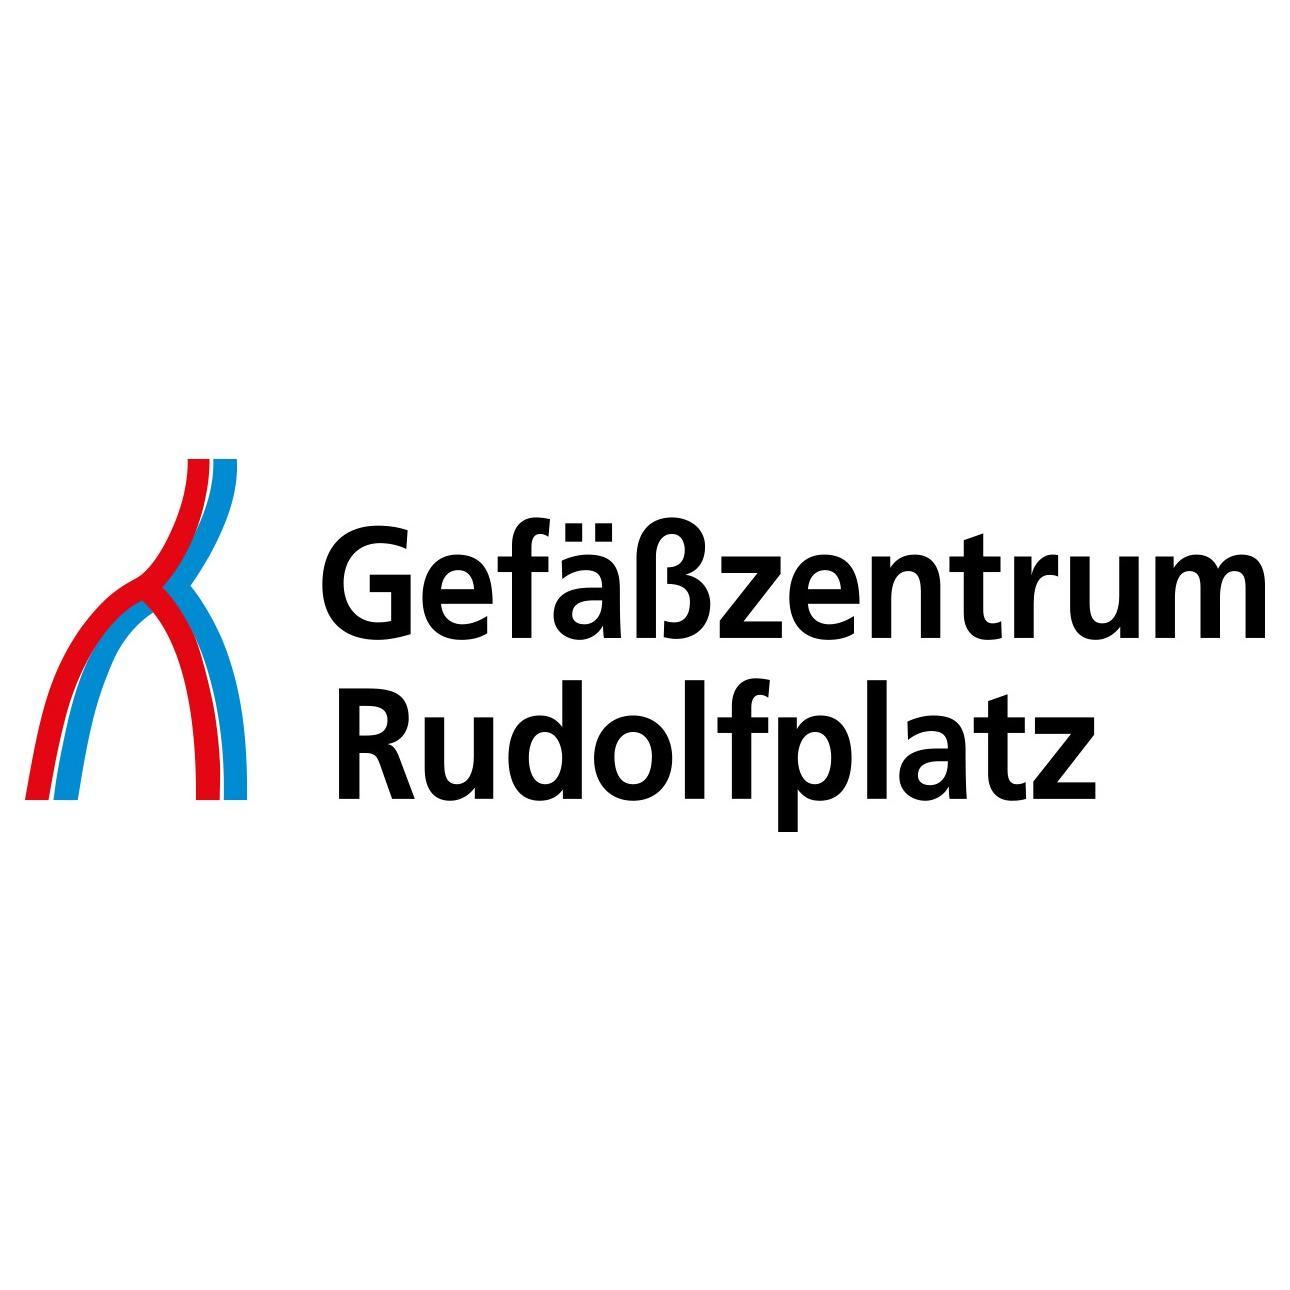 Bild zu MVZ Corius Köln GmbH - Das Gefäßzentrum am Rudolfplatz I Köln in Köln